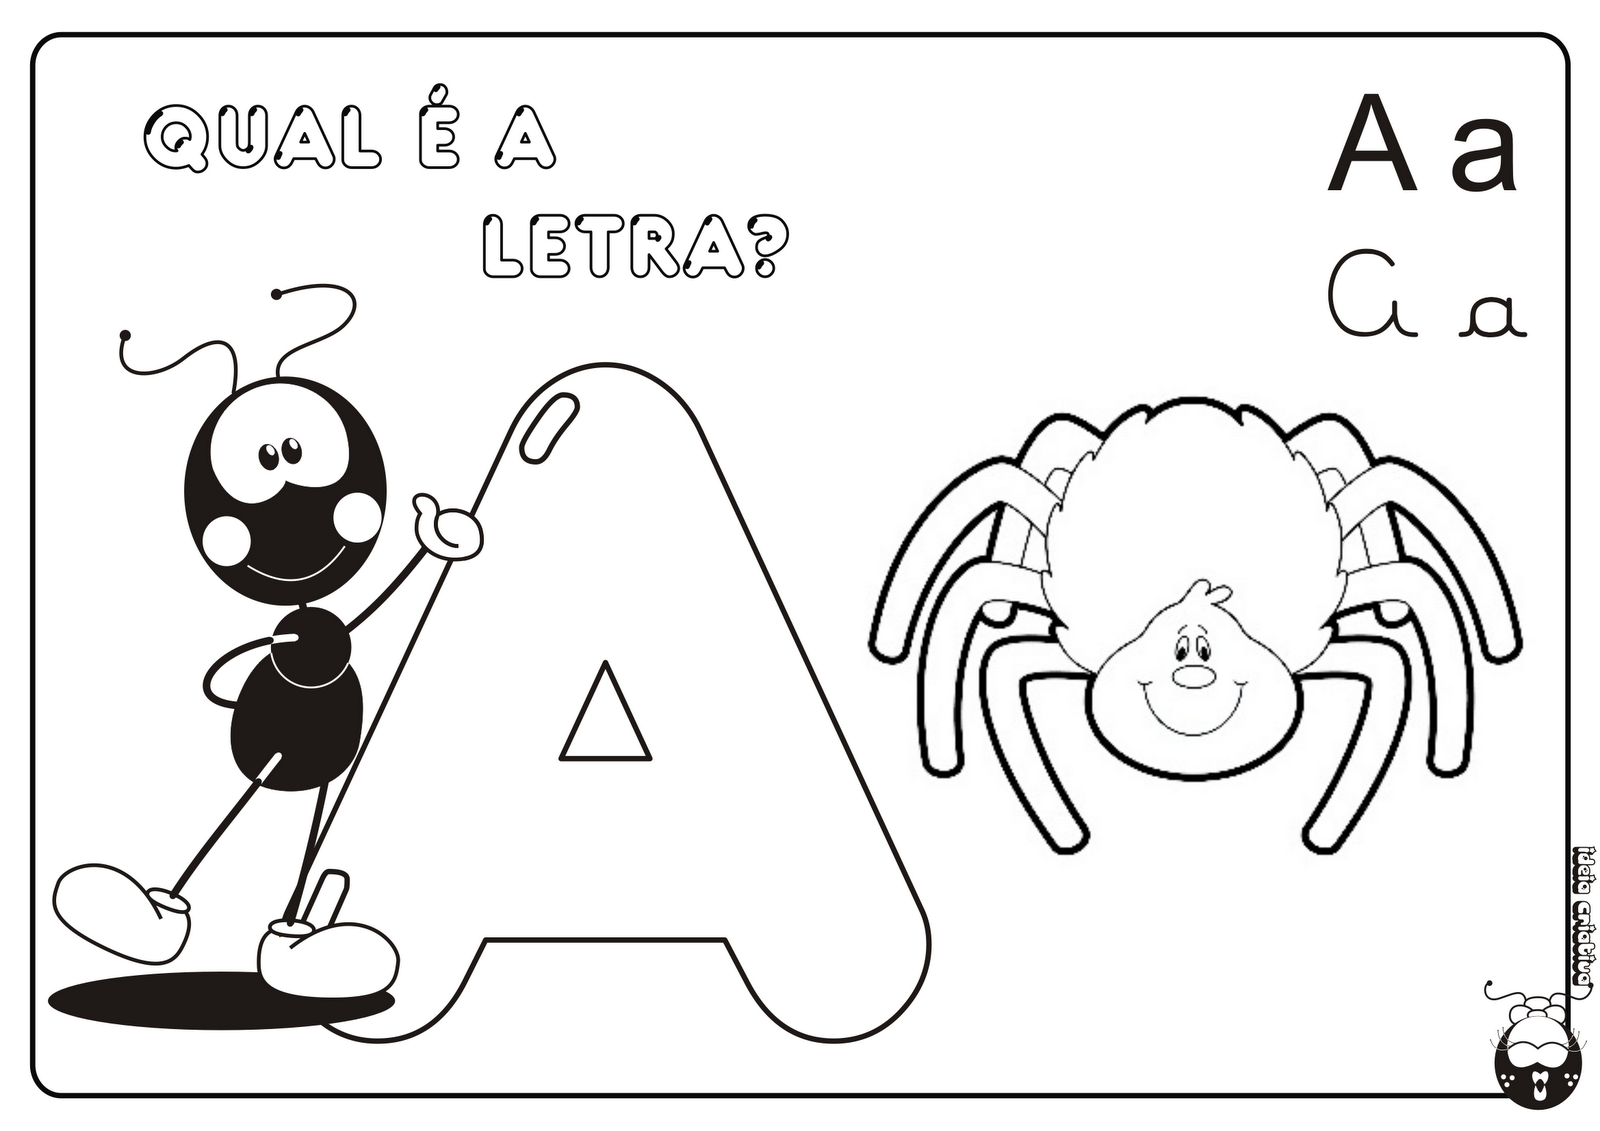 Alfabeto Smilinguido 4 tipos de letra para Baixar Grátis Letra A